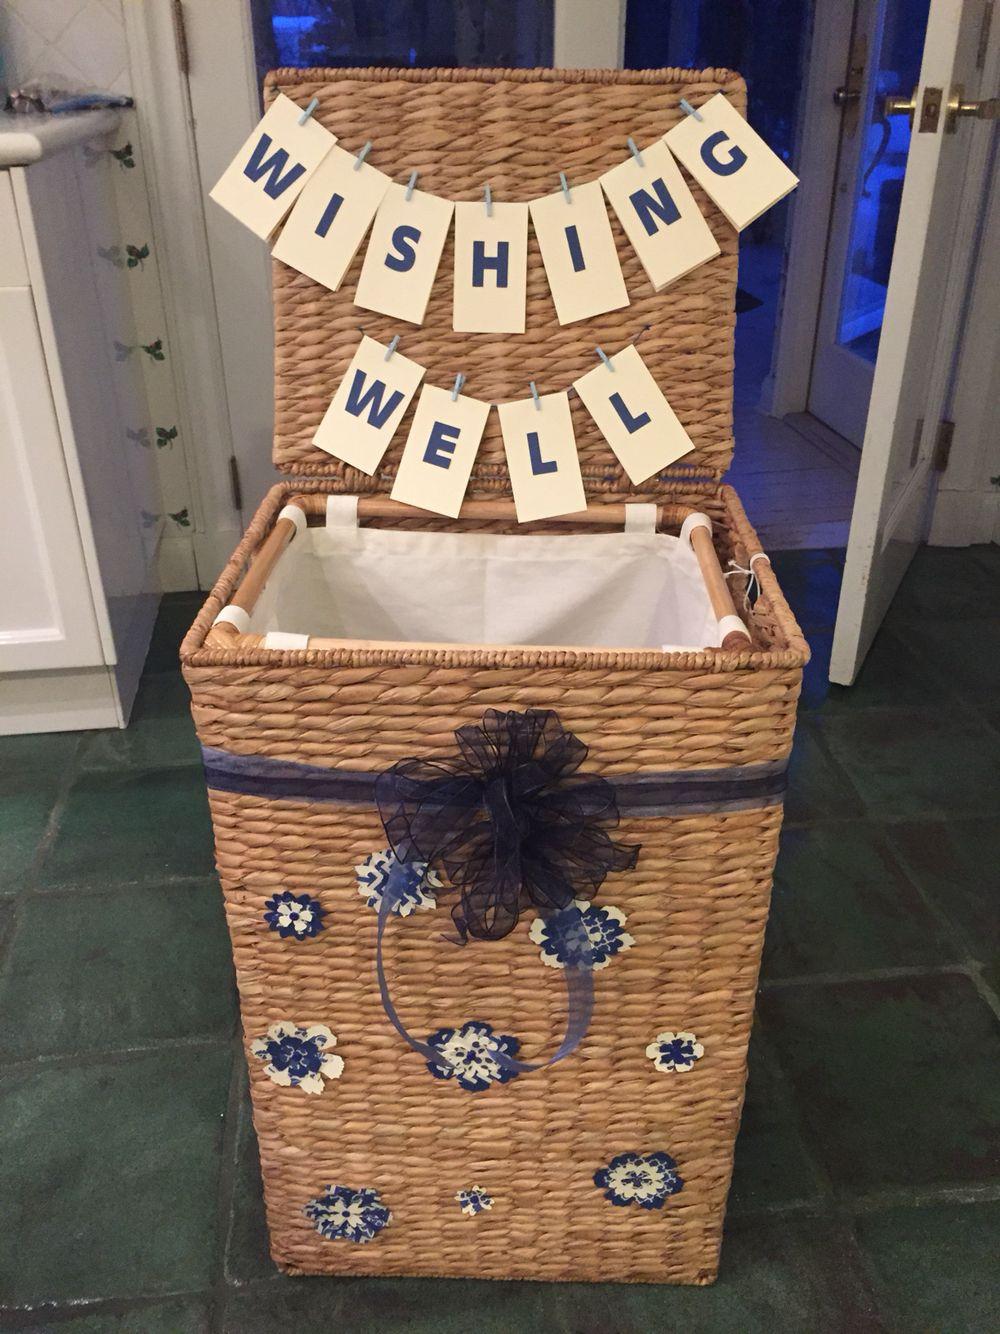 Baby Shower Wishing Well Gift Ideas  Beautiful wishing well and wishing well hamper is also a